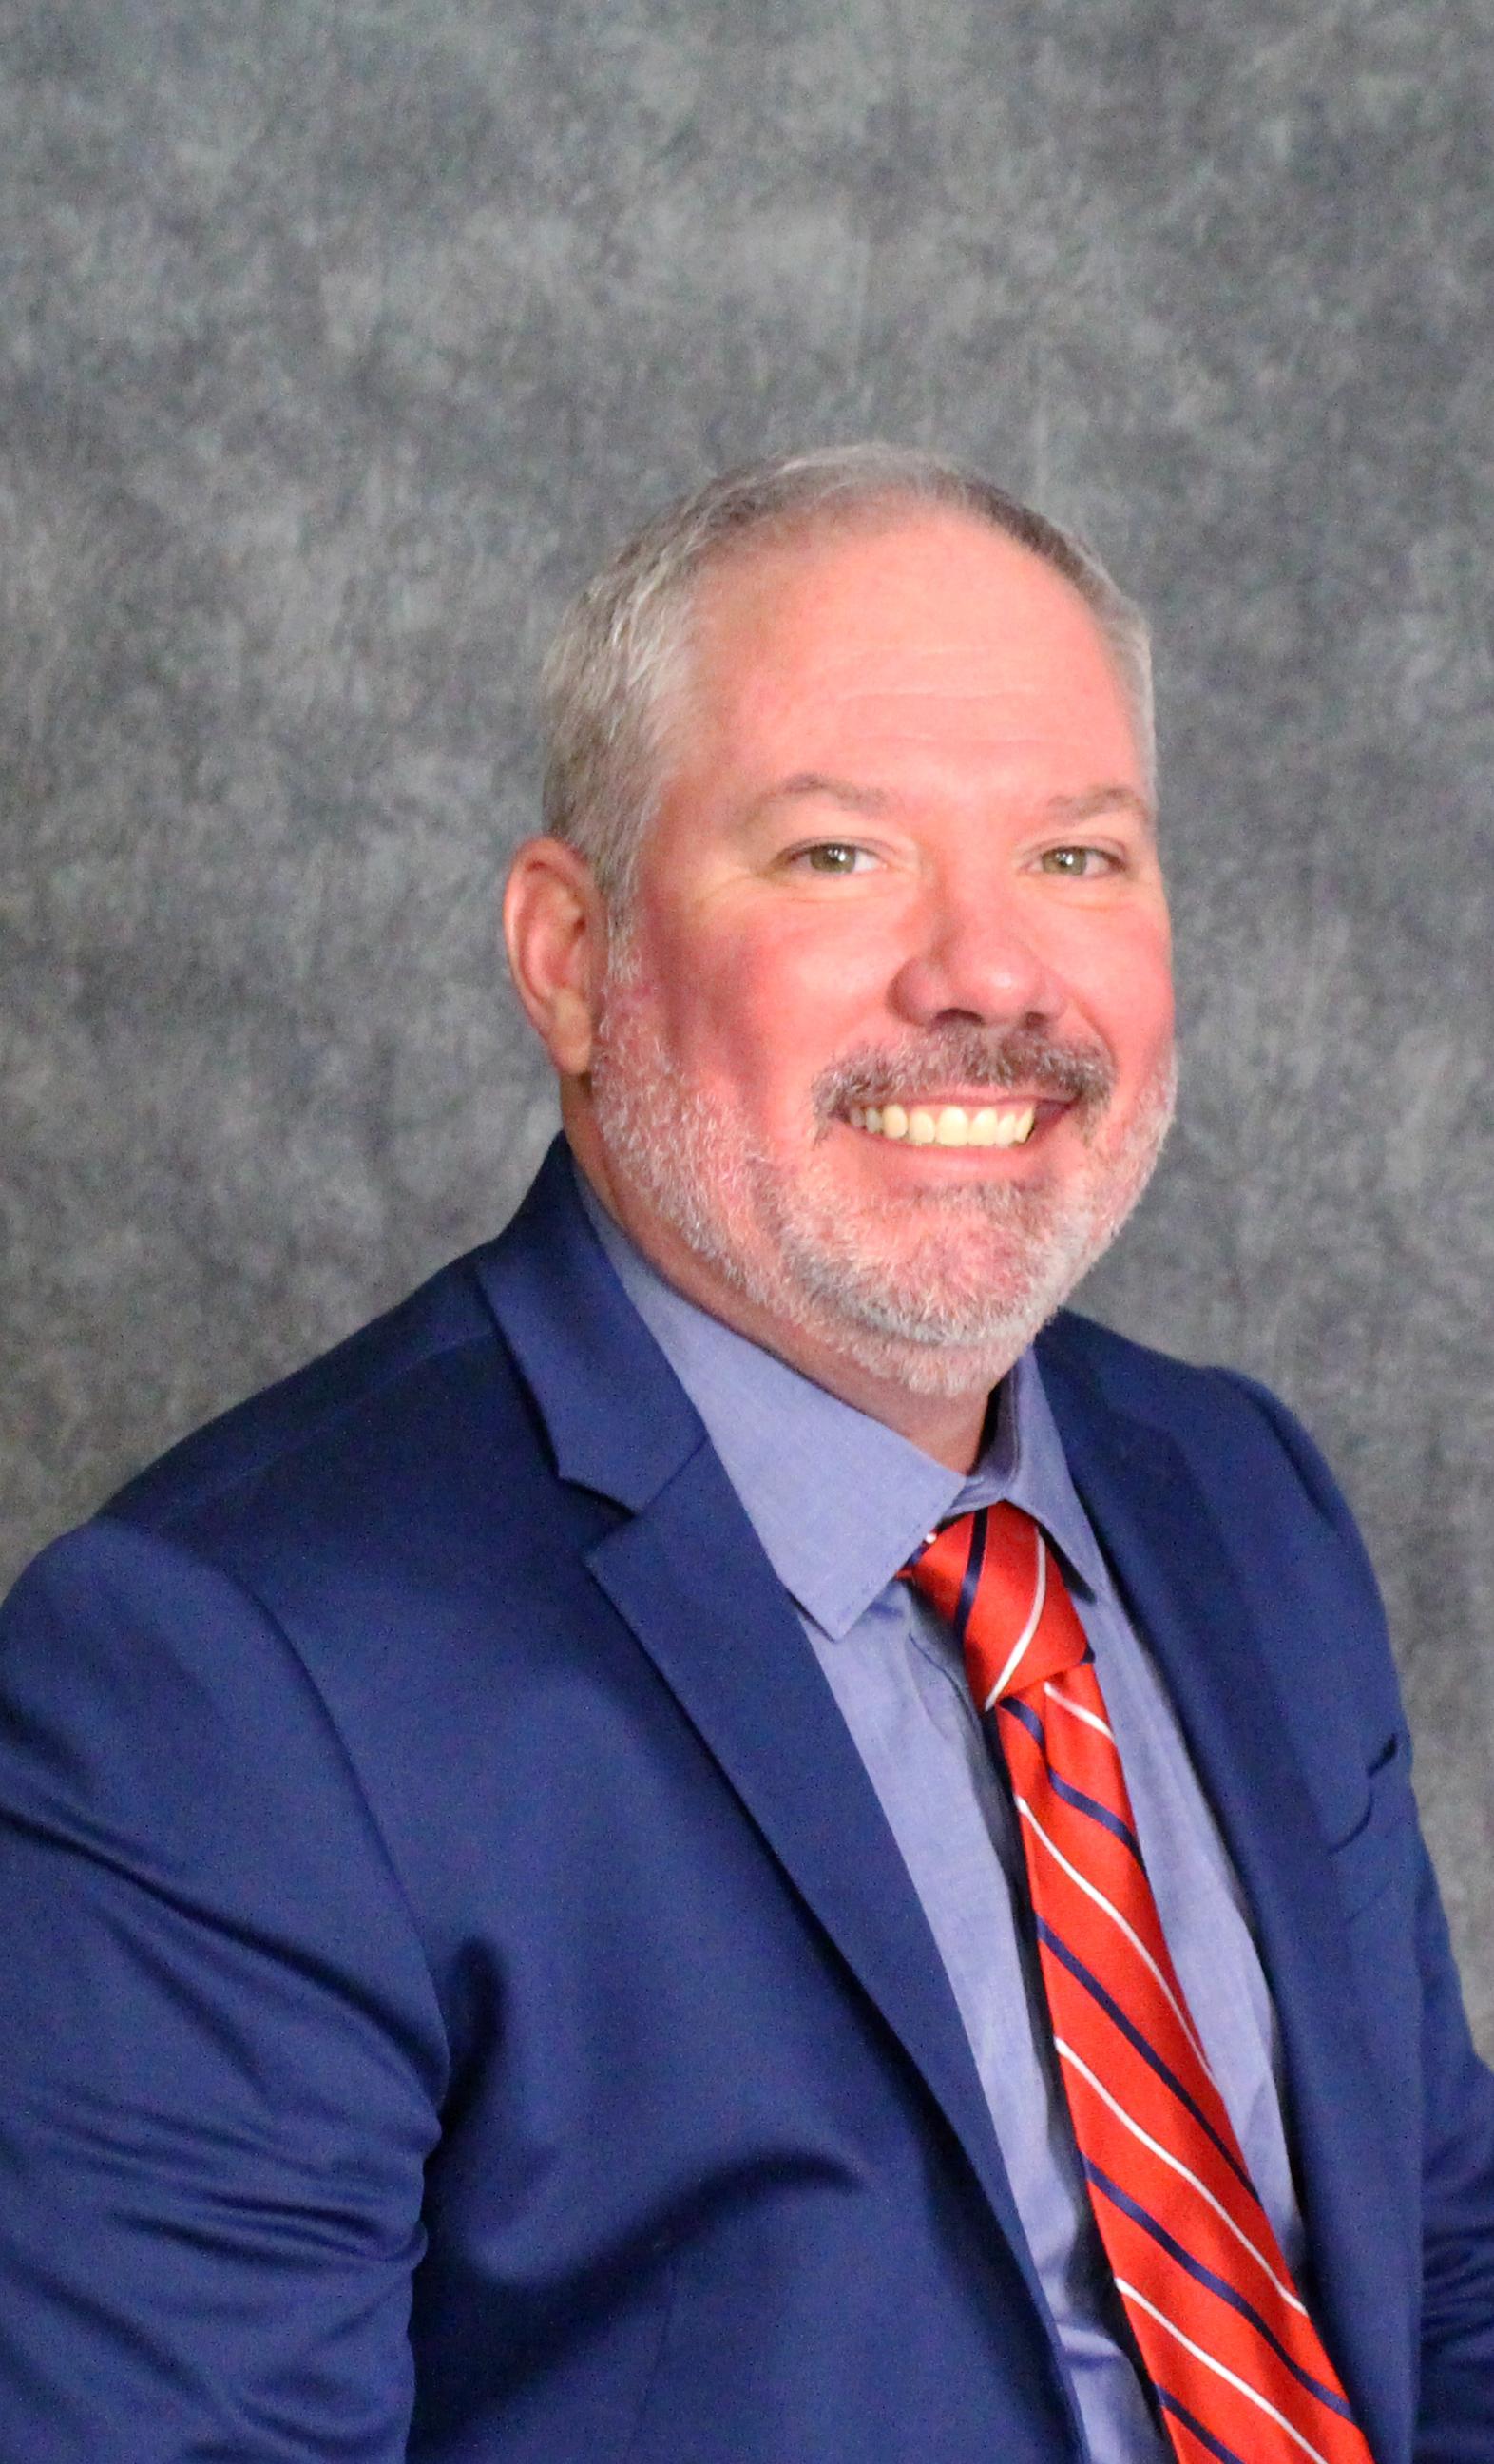 JC Powell, Vicepresidente de Ventas